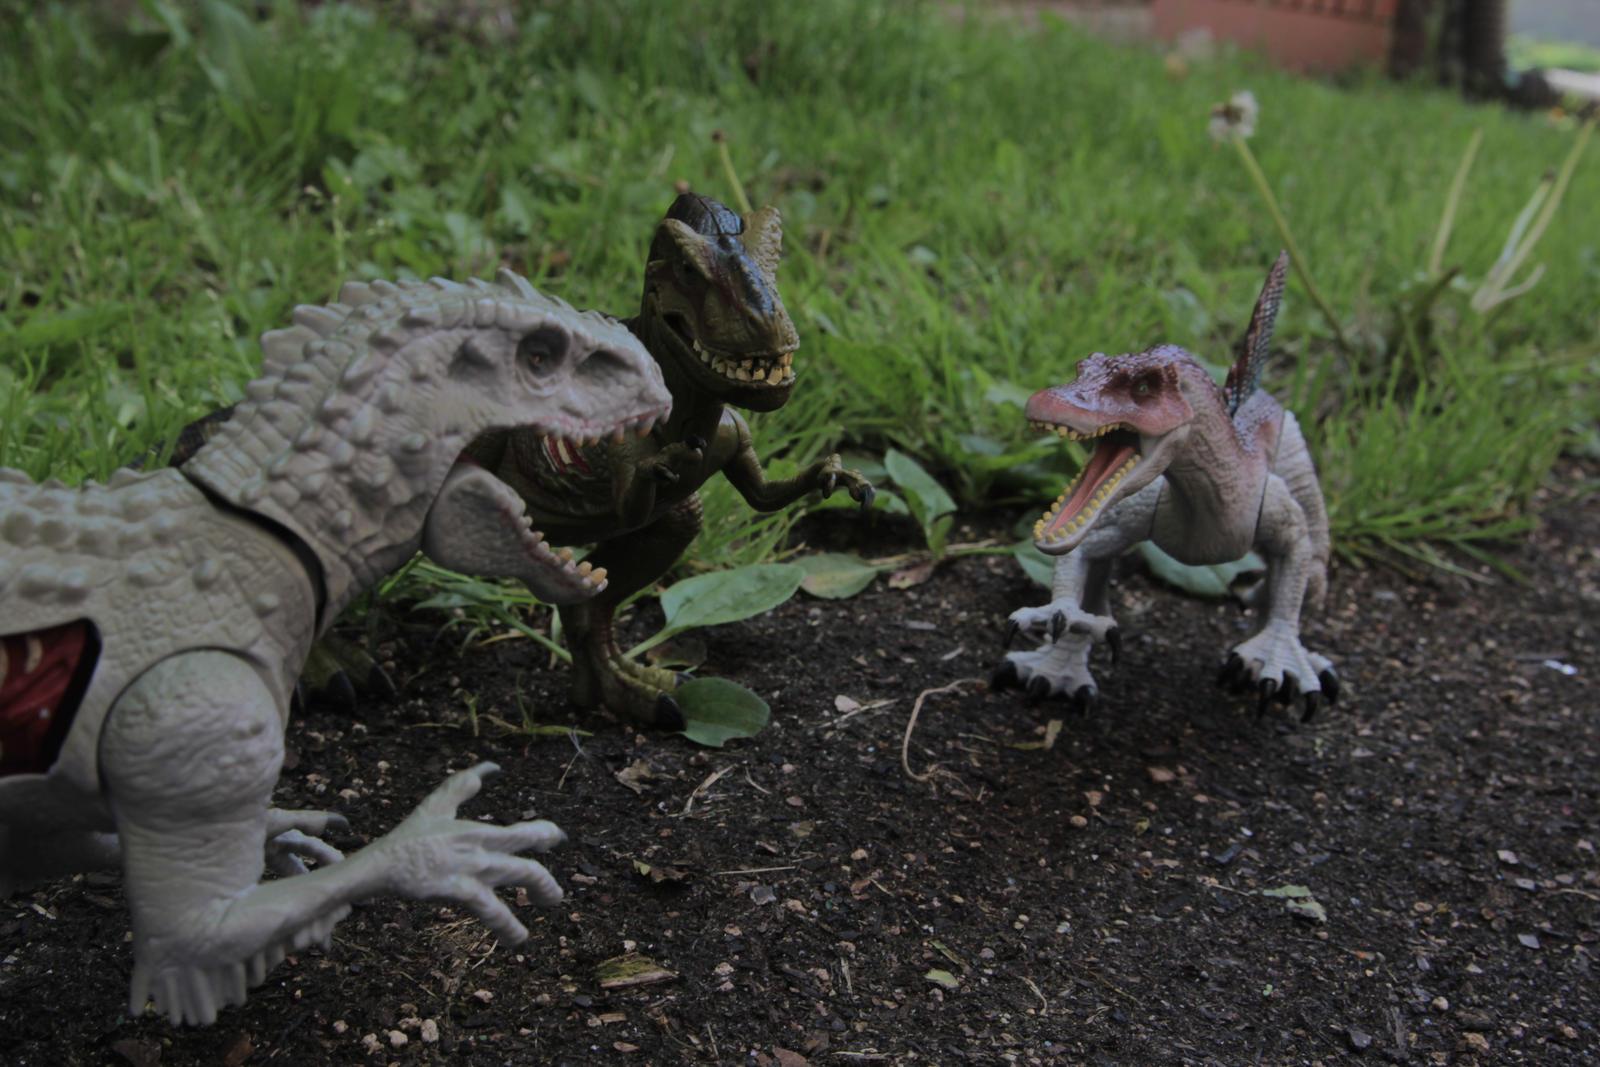 Dino Wall Stickers Indominus Rex Vs Tyrannosaurus Rex Vs Spinosaurus By